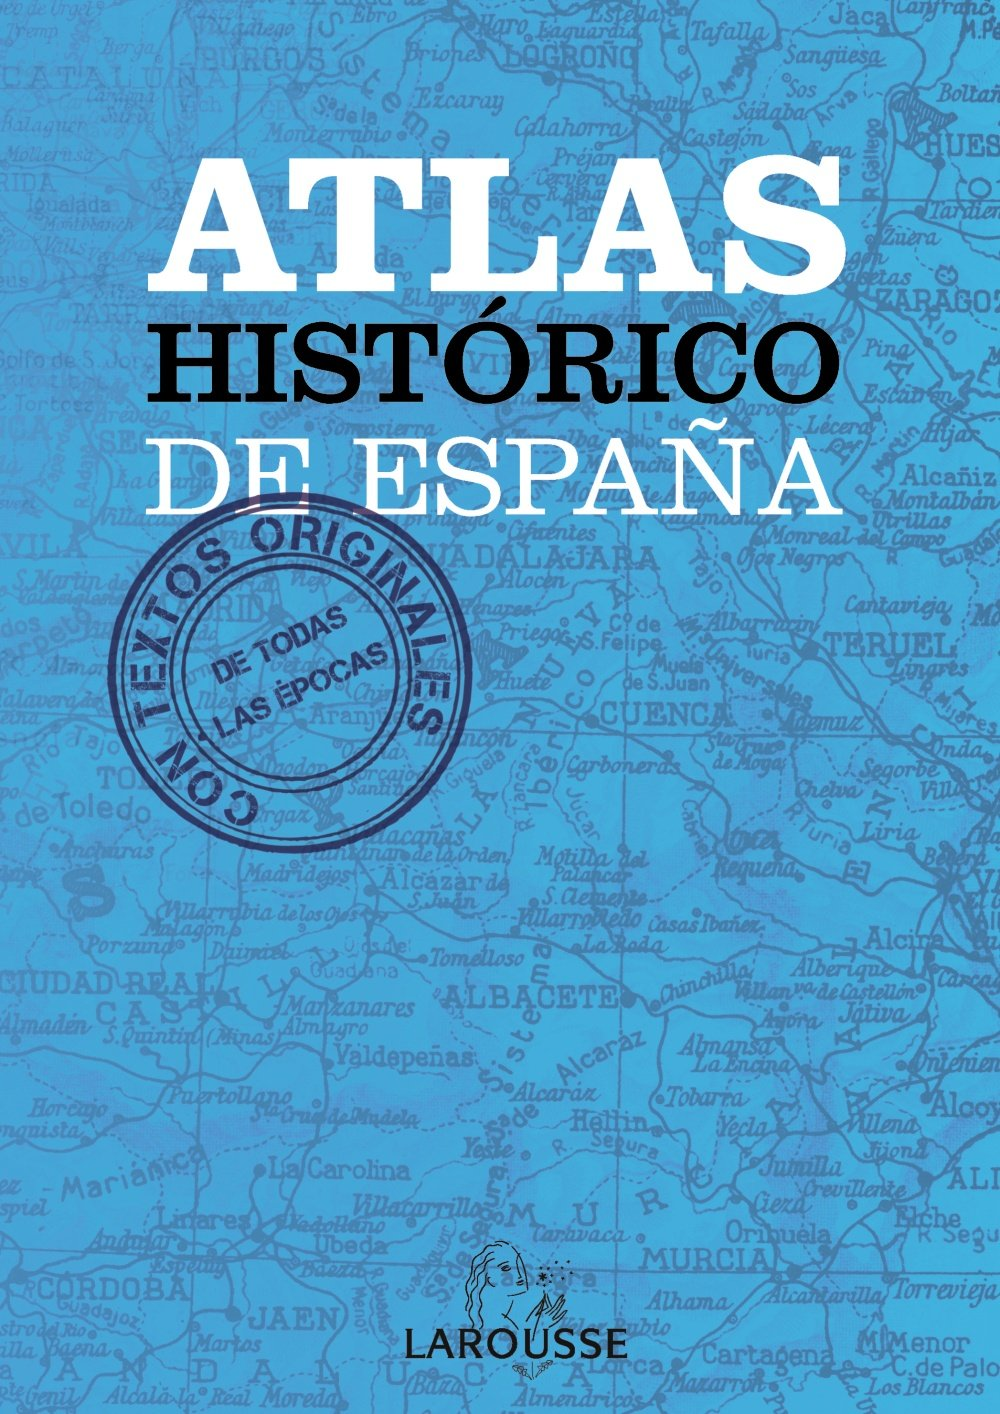 Atlas Histórico de España (Larousse - Atlas): Amazon.es: Aa.Vv.: Libros